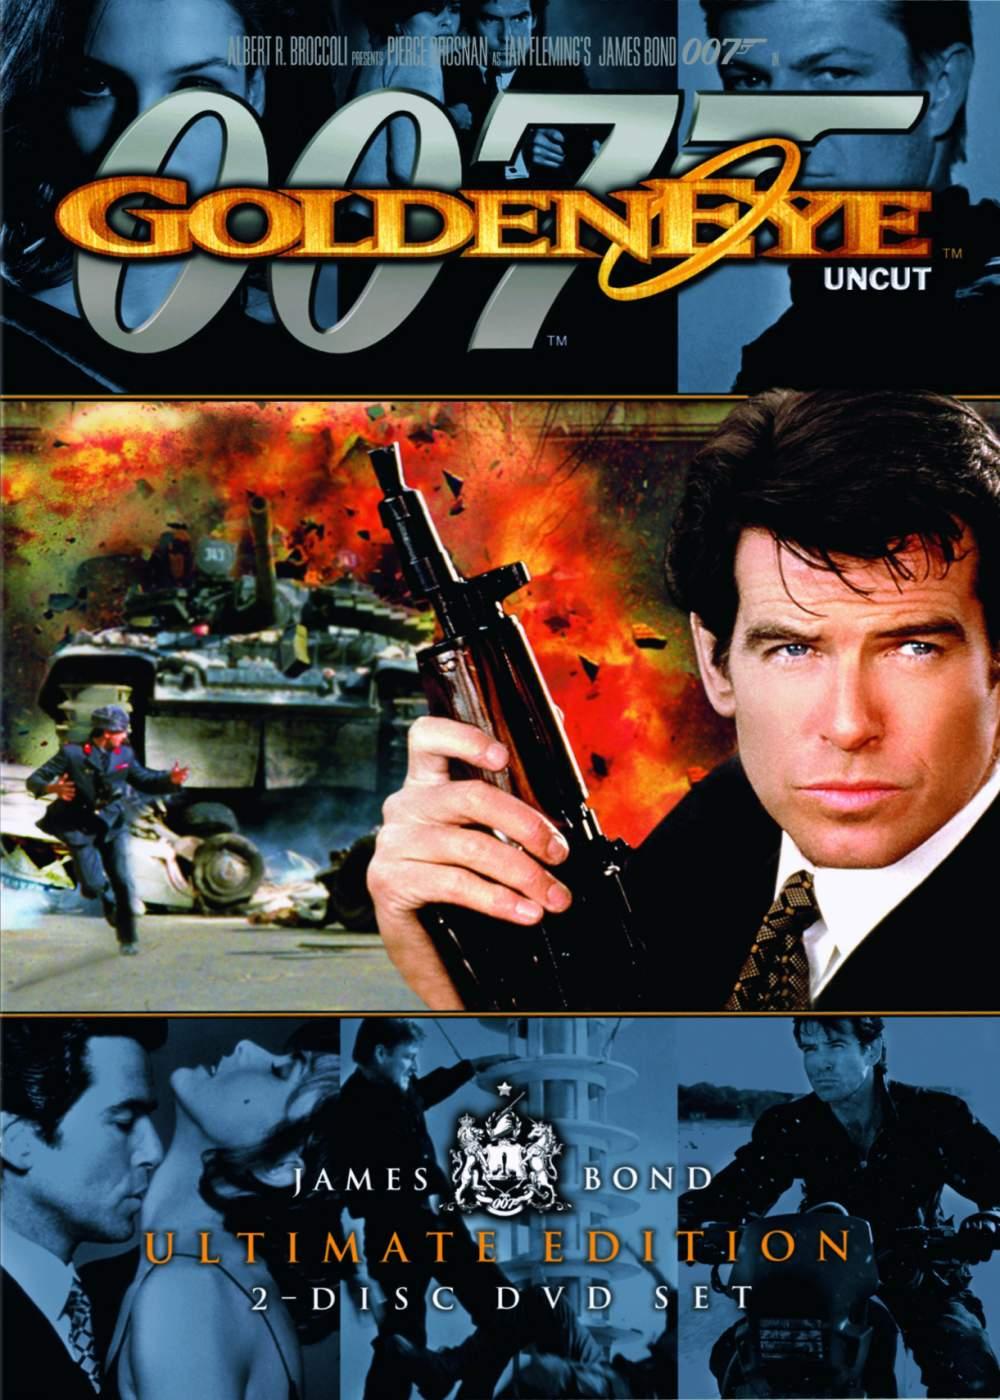 James Bond 007 - Goldeneye - Film